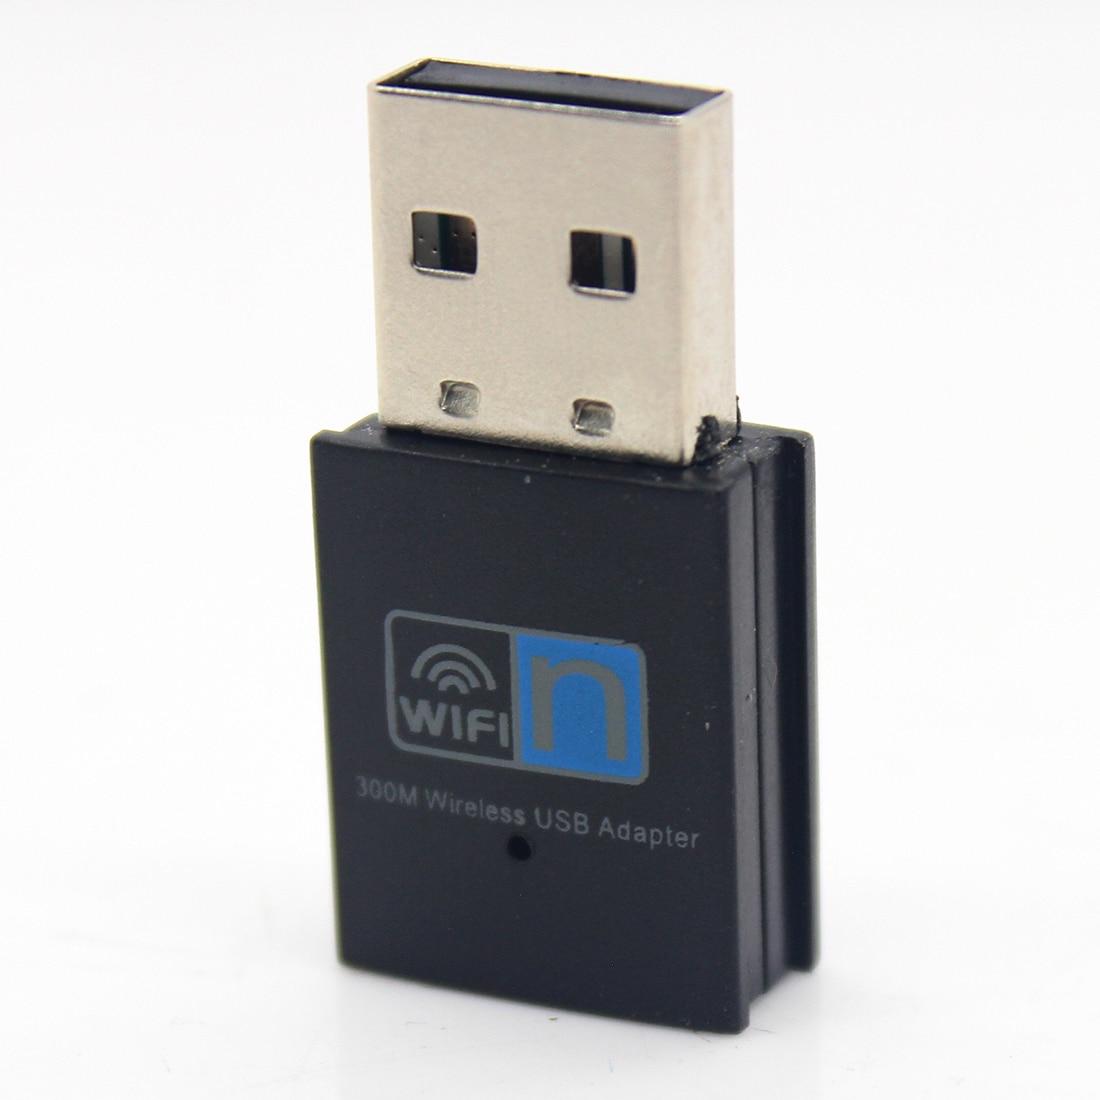 NOYOKERE Mini 300M USB2.0 RTL8192 Wifi Dongle WiFi Adapter Wireless Wifi Dongle Network Card 802.11 N/g/b Wi Fi LAN Adapter